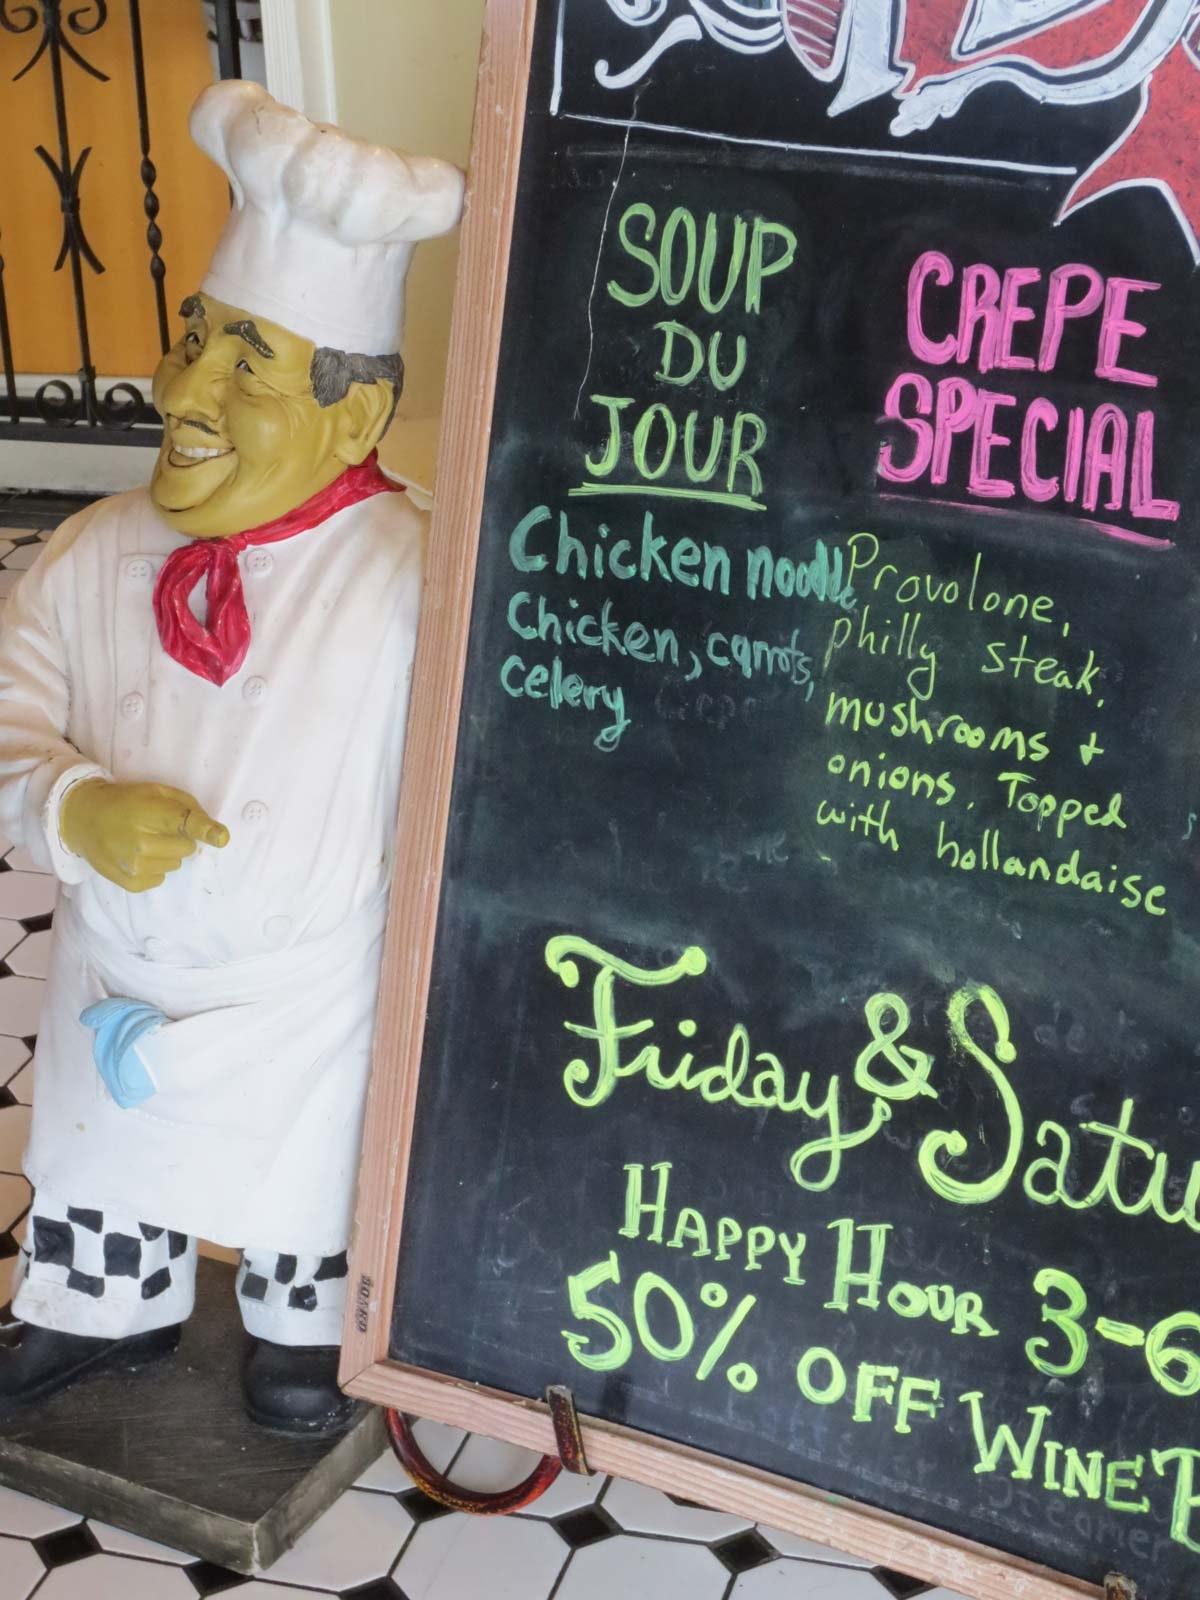 Chez Elle Creperie & Coffeehouse